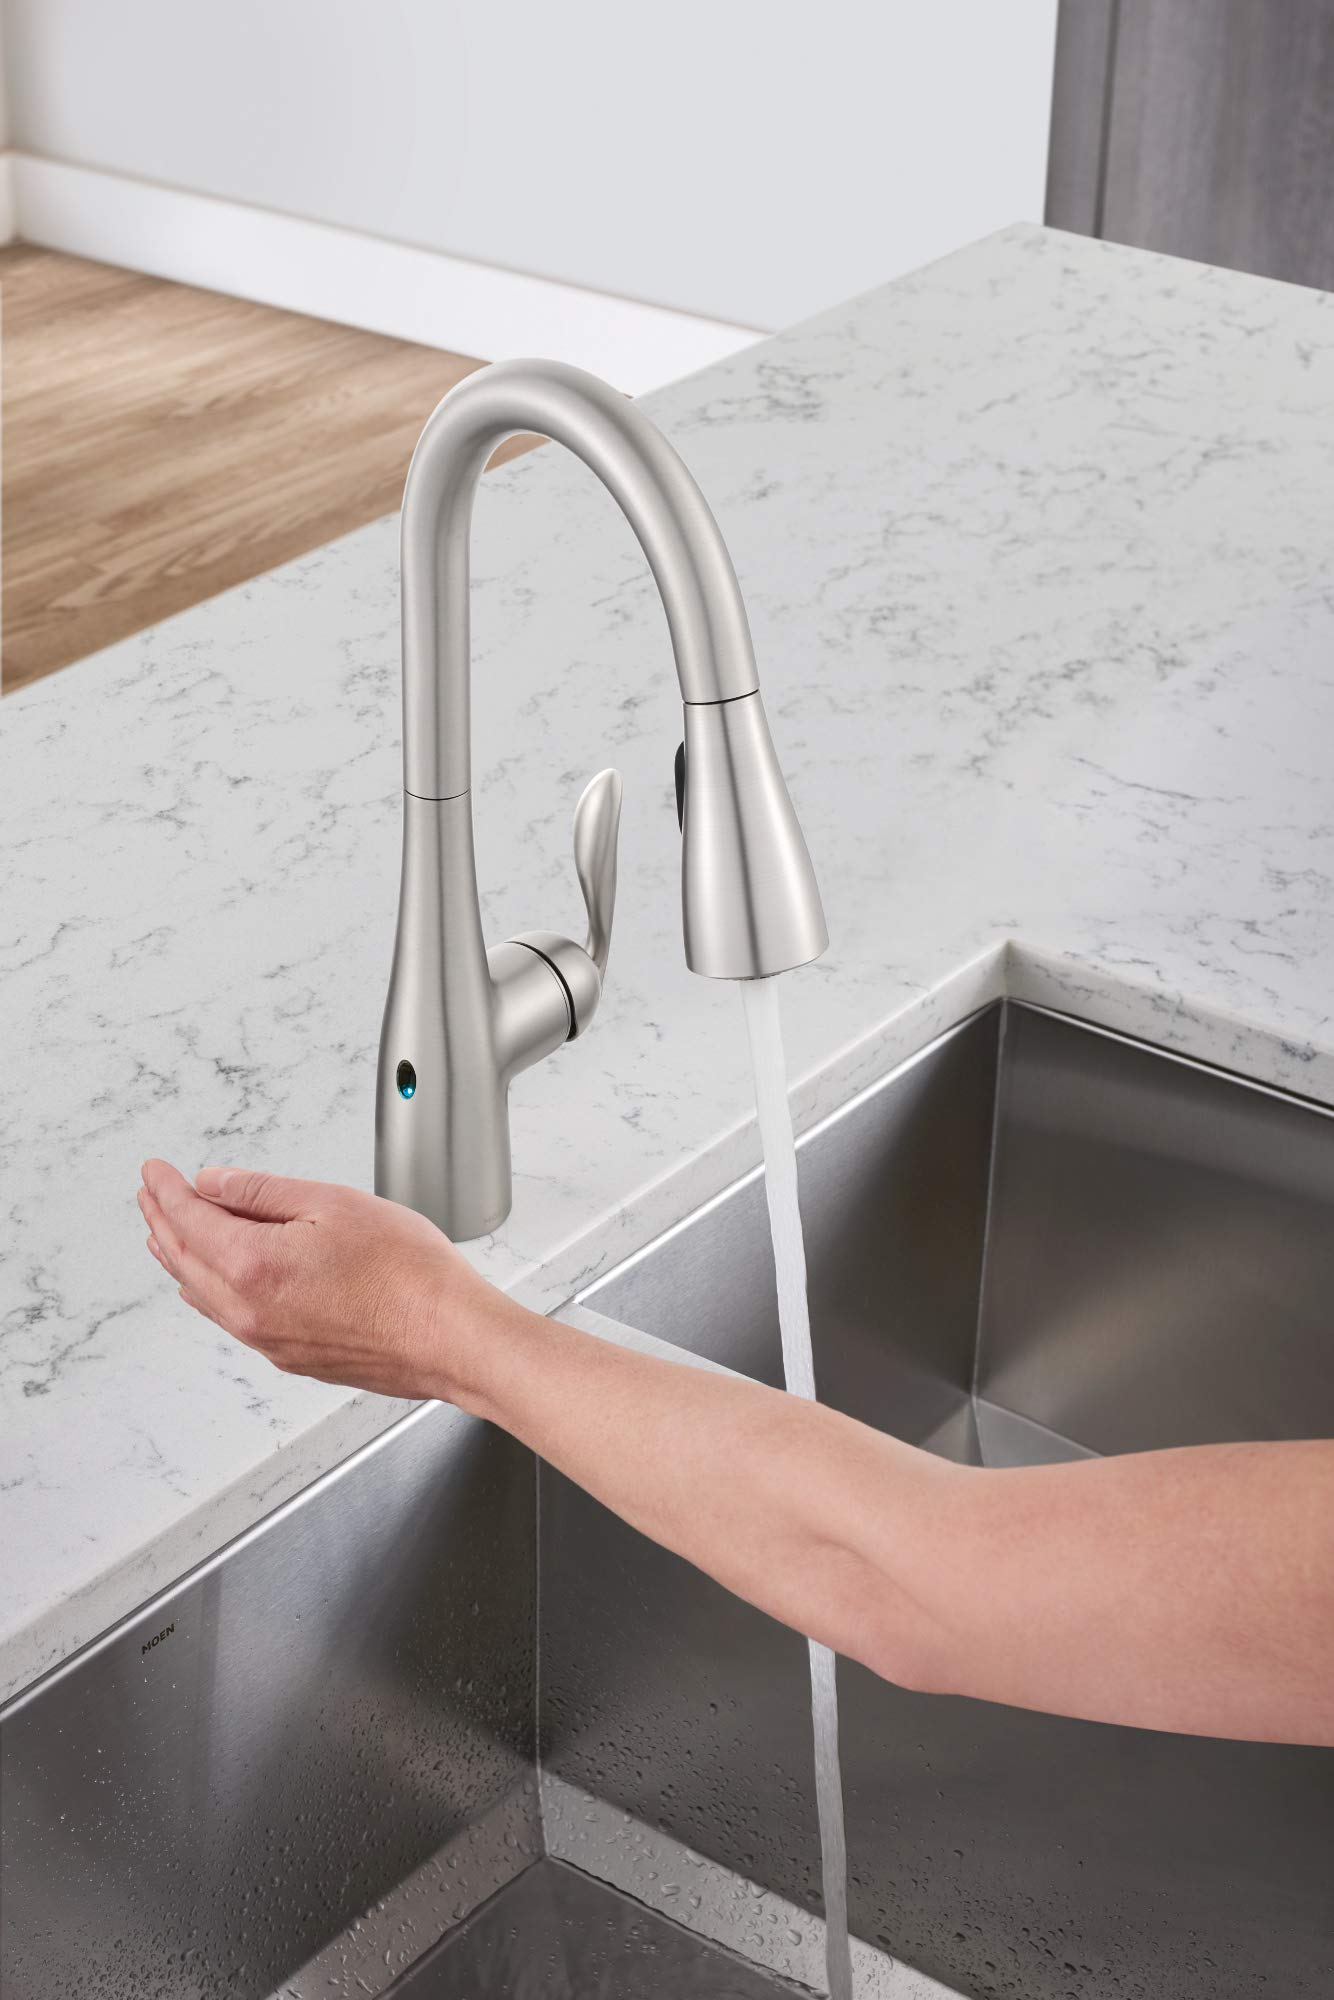 Moen Arbor Motionsense Wave Sensor Touchless One-Handle High Arc Pulldown  Kitchen Faucet Featuring Reflex